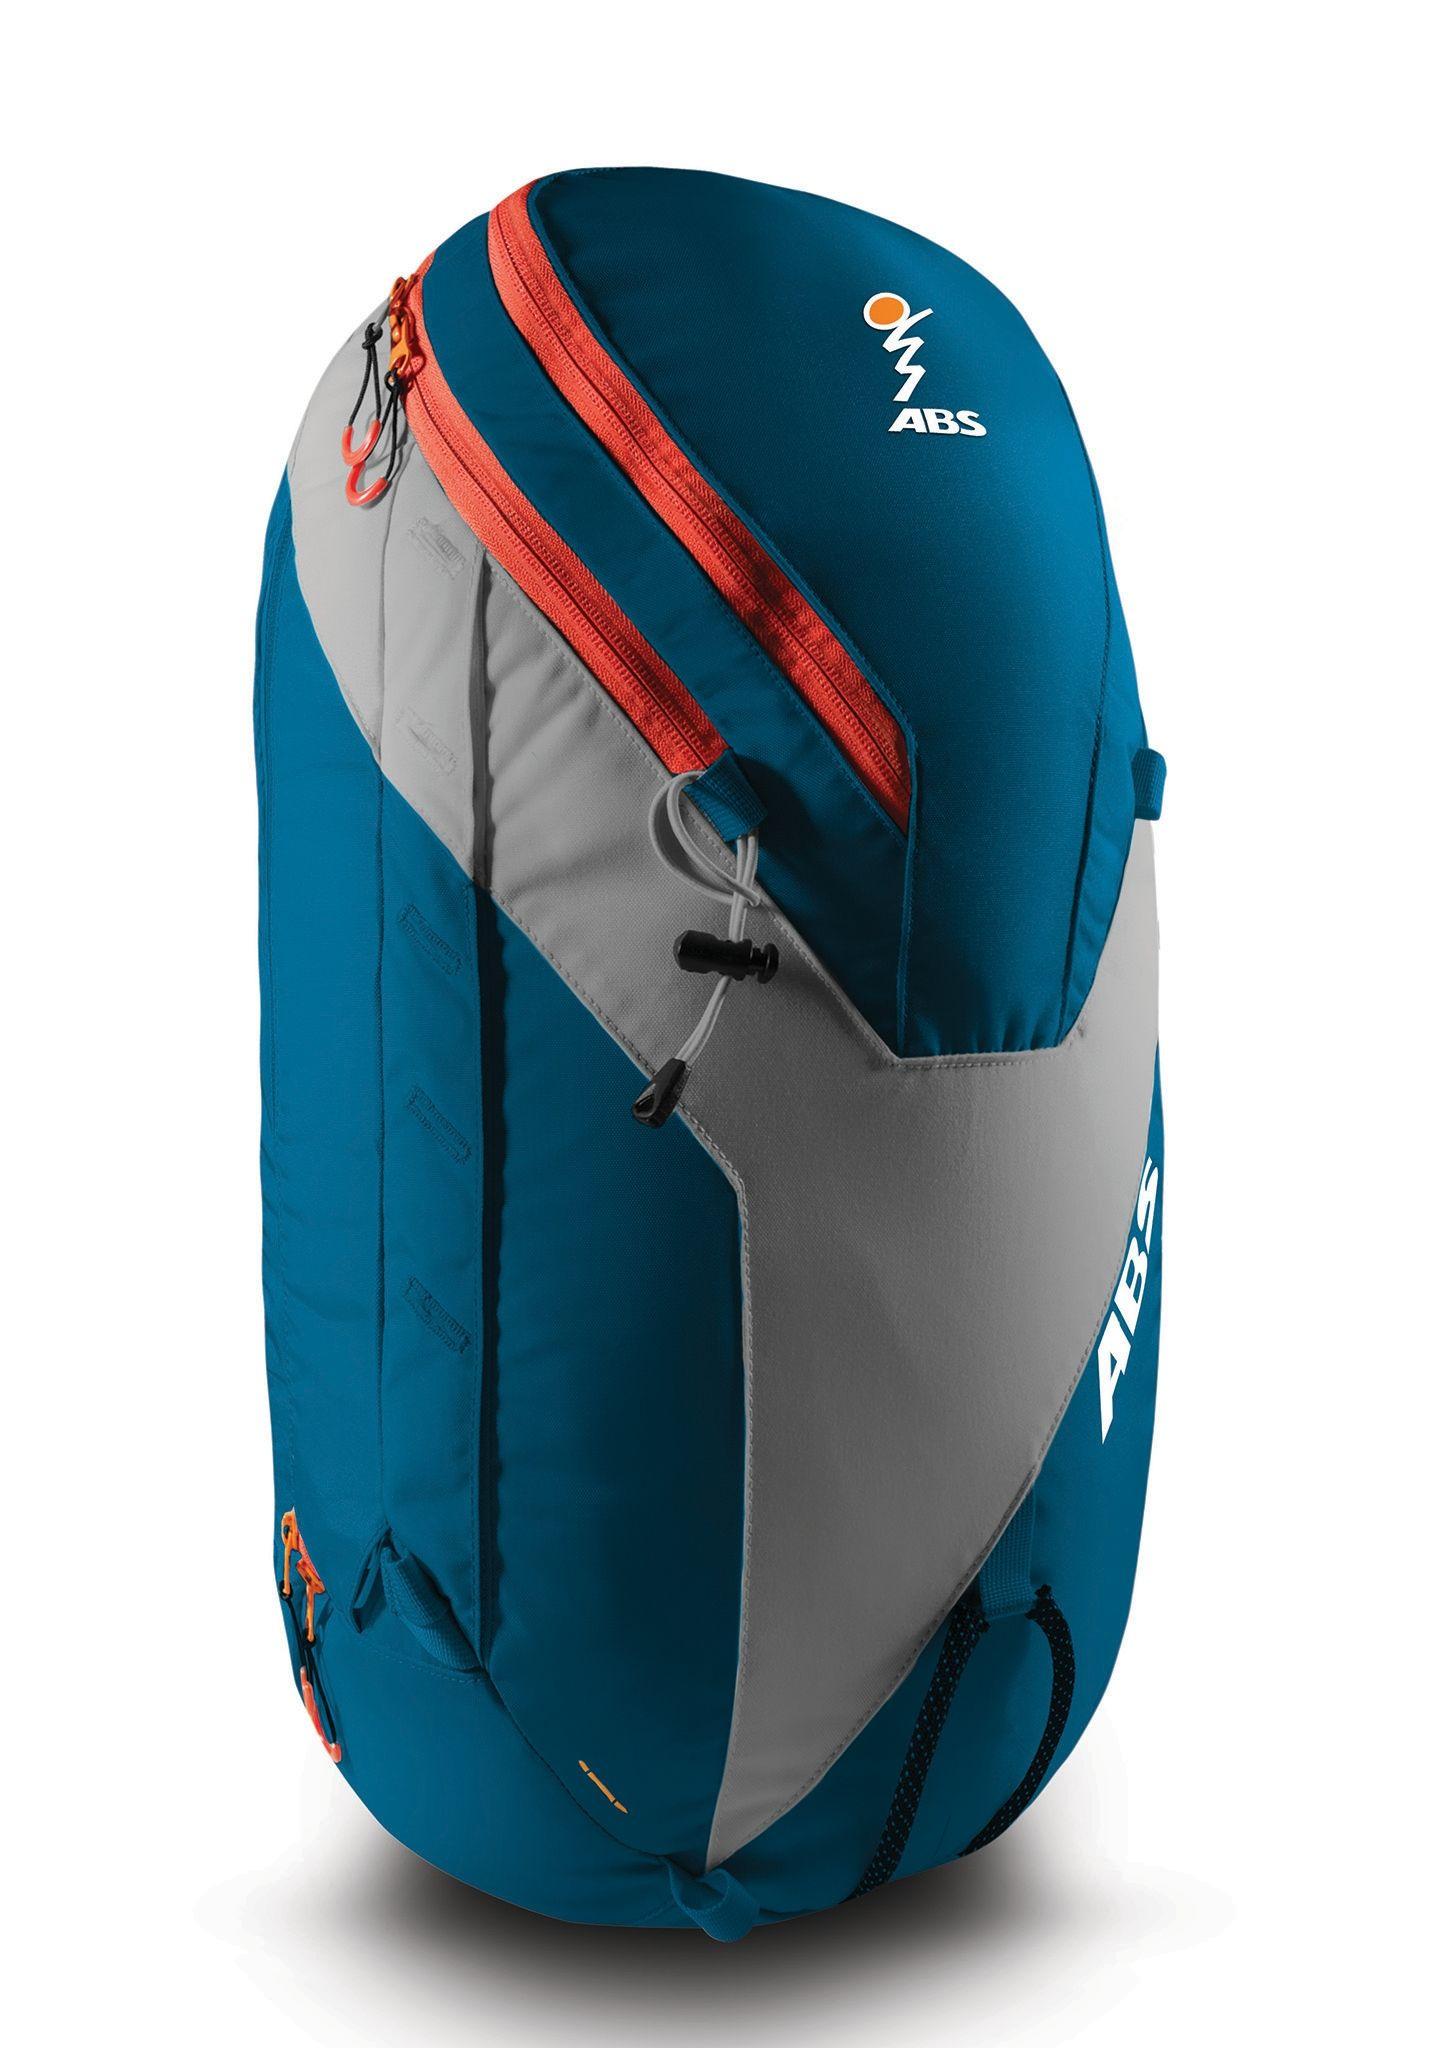 ABS Vario 32L Zip-on - Blue/Orange - Front View